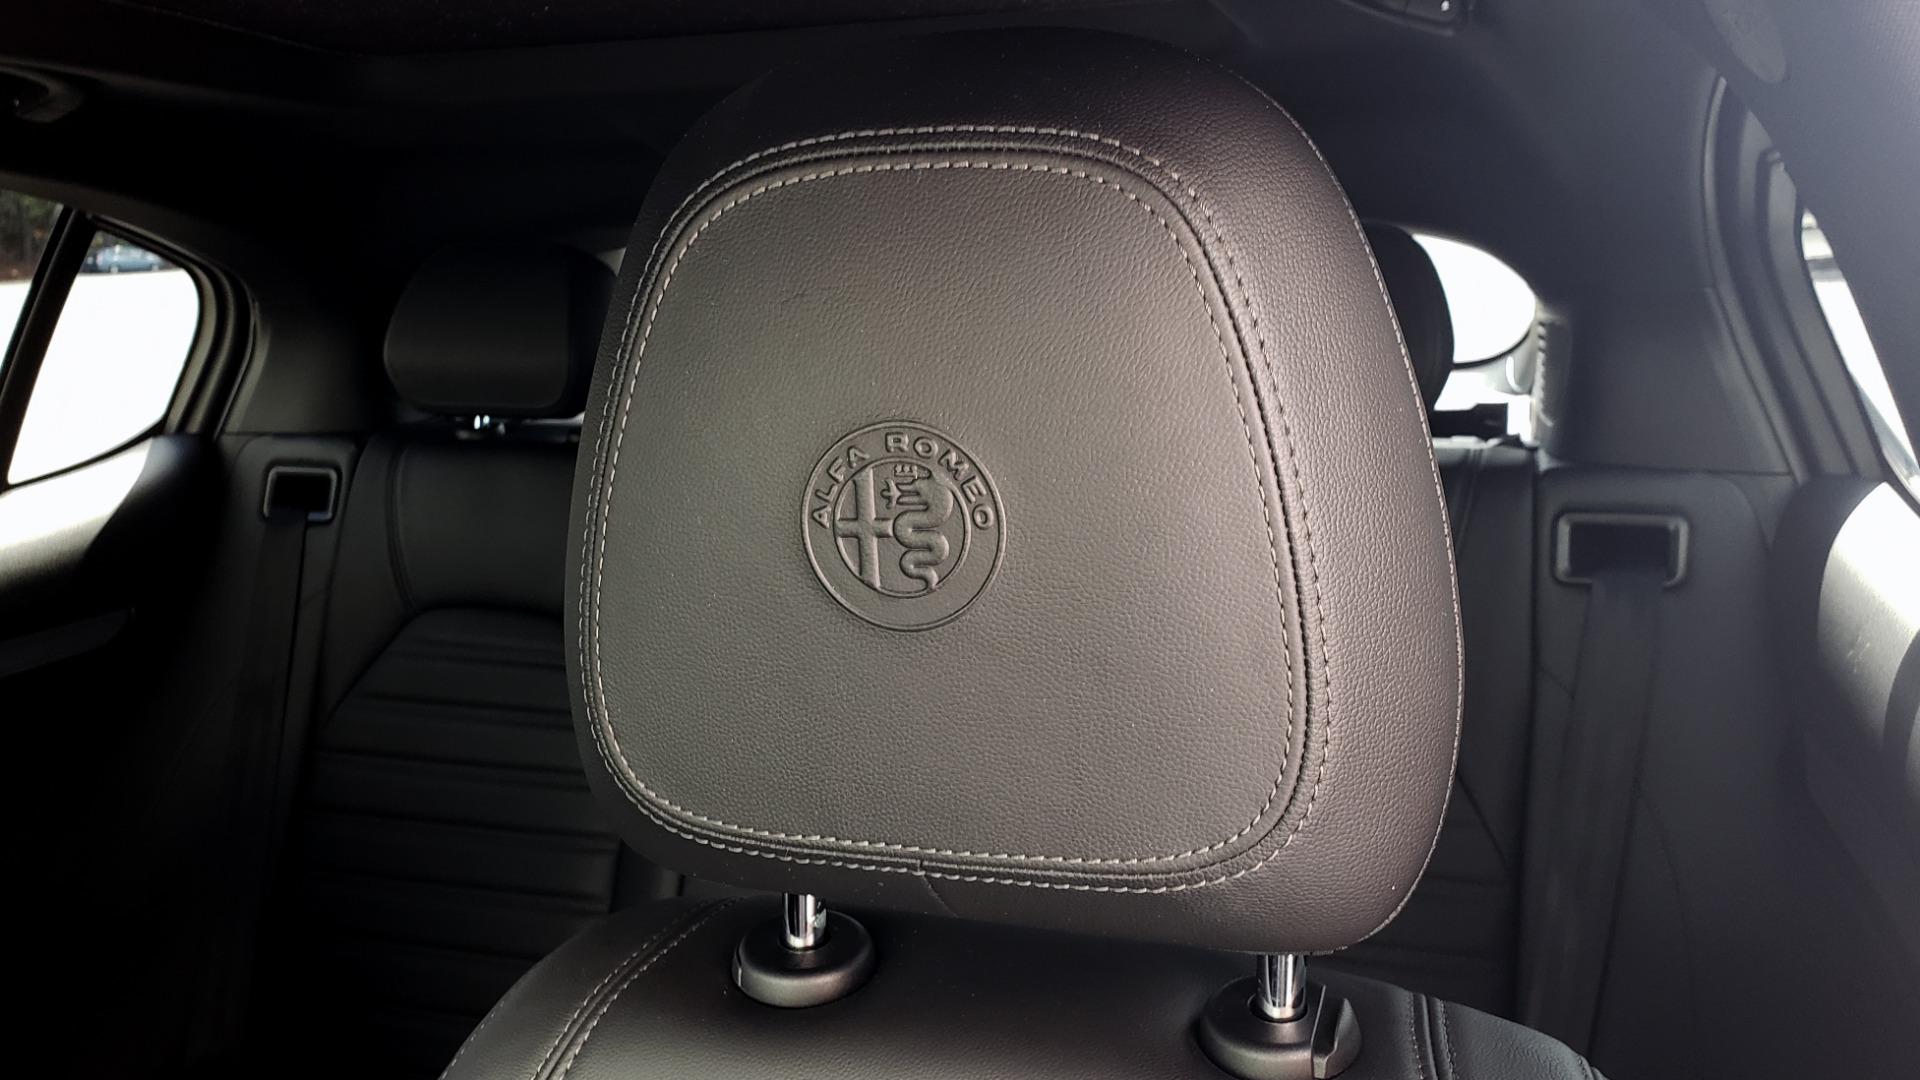 Used 2019 Alfa Romeo STELVIO TI SPORT AWD / 2.0L TURBO / 8-SPD AUTO / DRVR ASST / REARVIEW for sale $37,495 at Formula Imports in Charlotte NC 28227 45